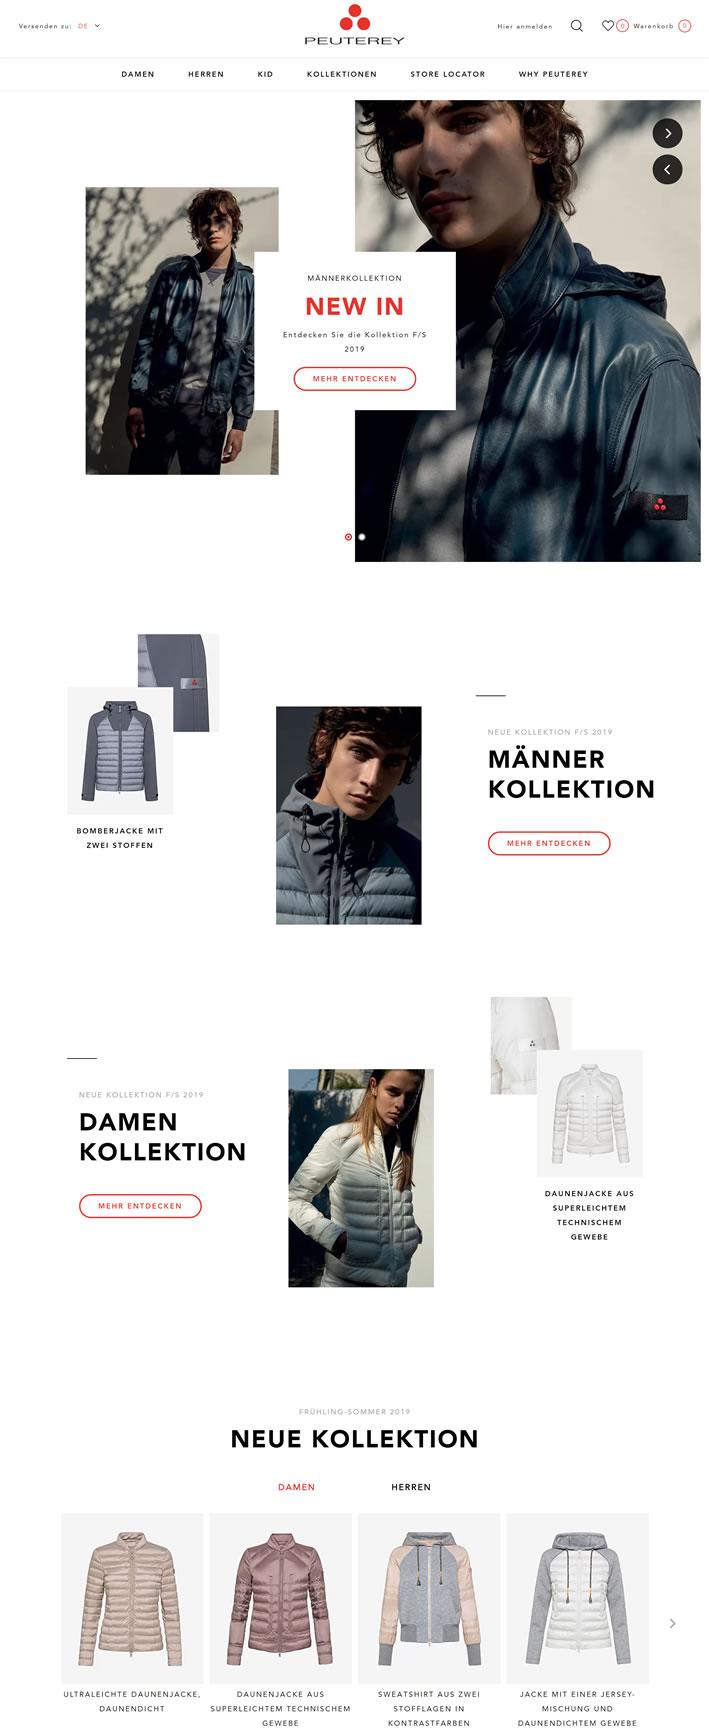 Peuterey德国官方商店:意大利奢侈休闲时尚品牌